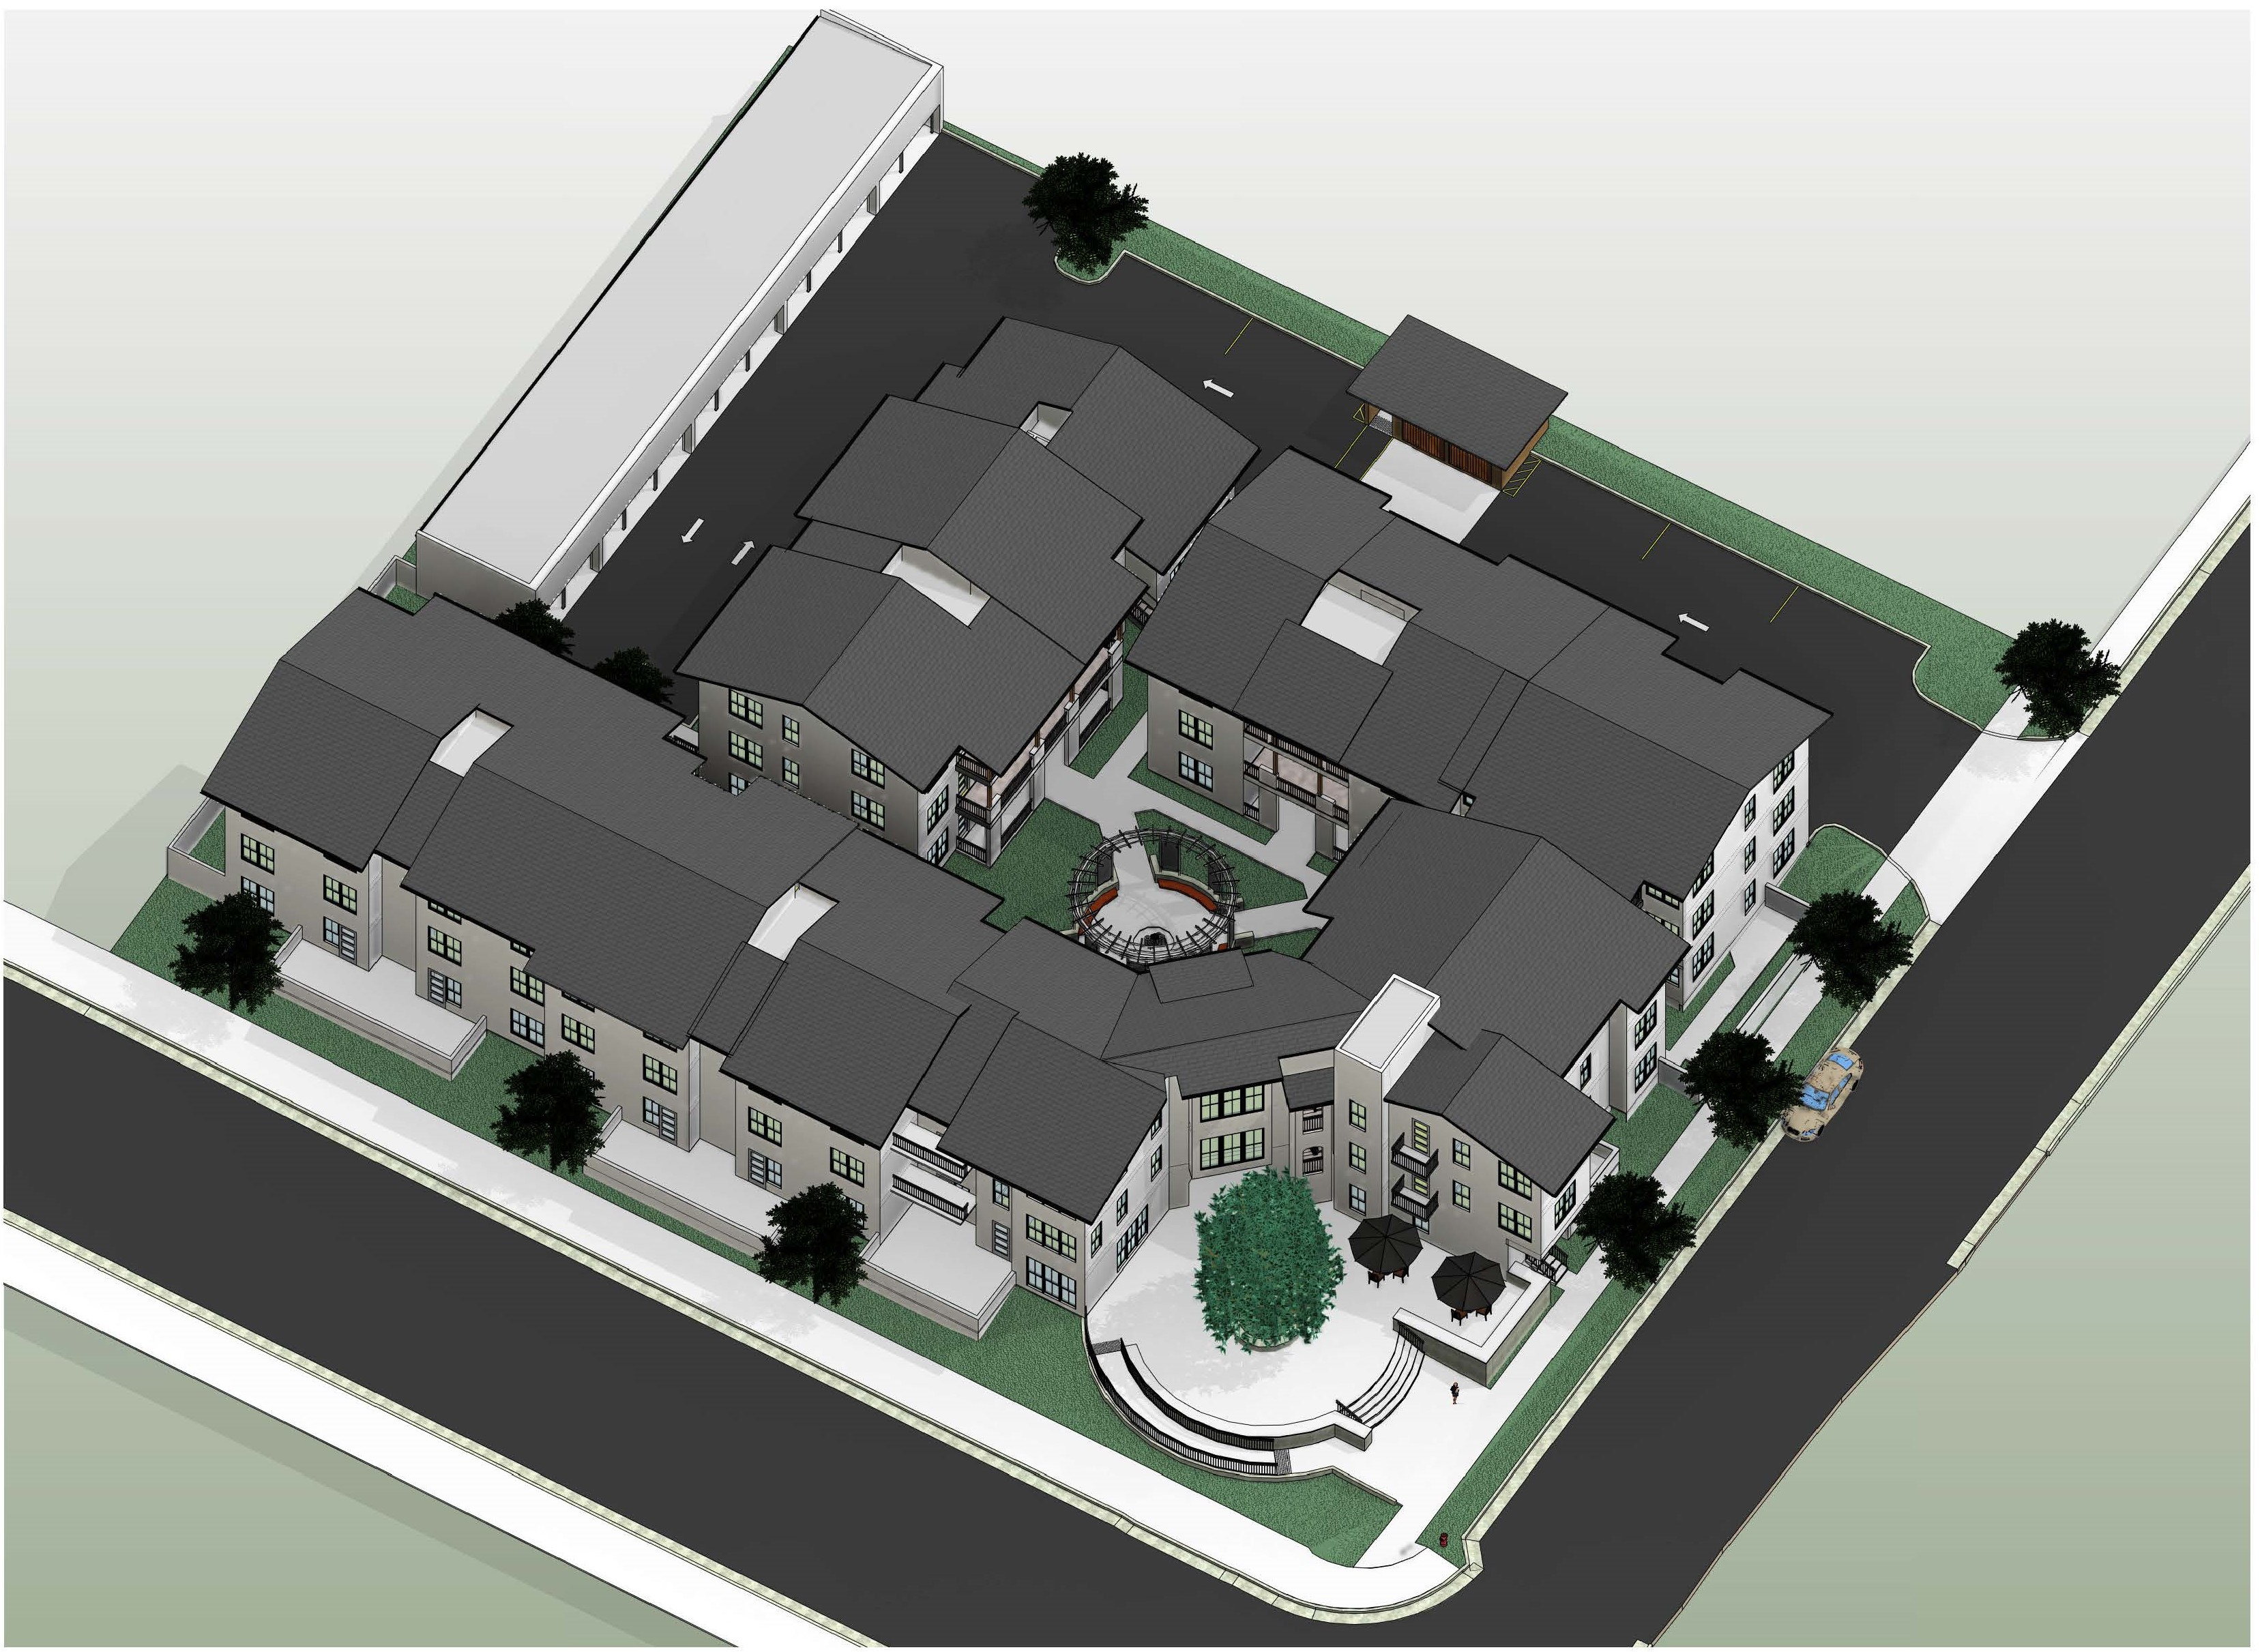 1650 Steele Concept Design Review powerp